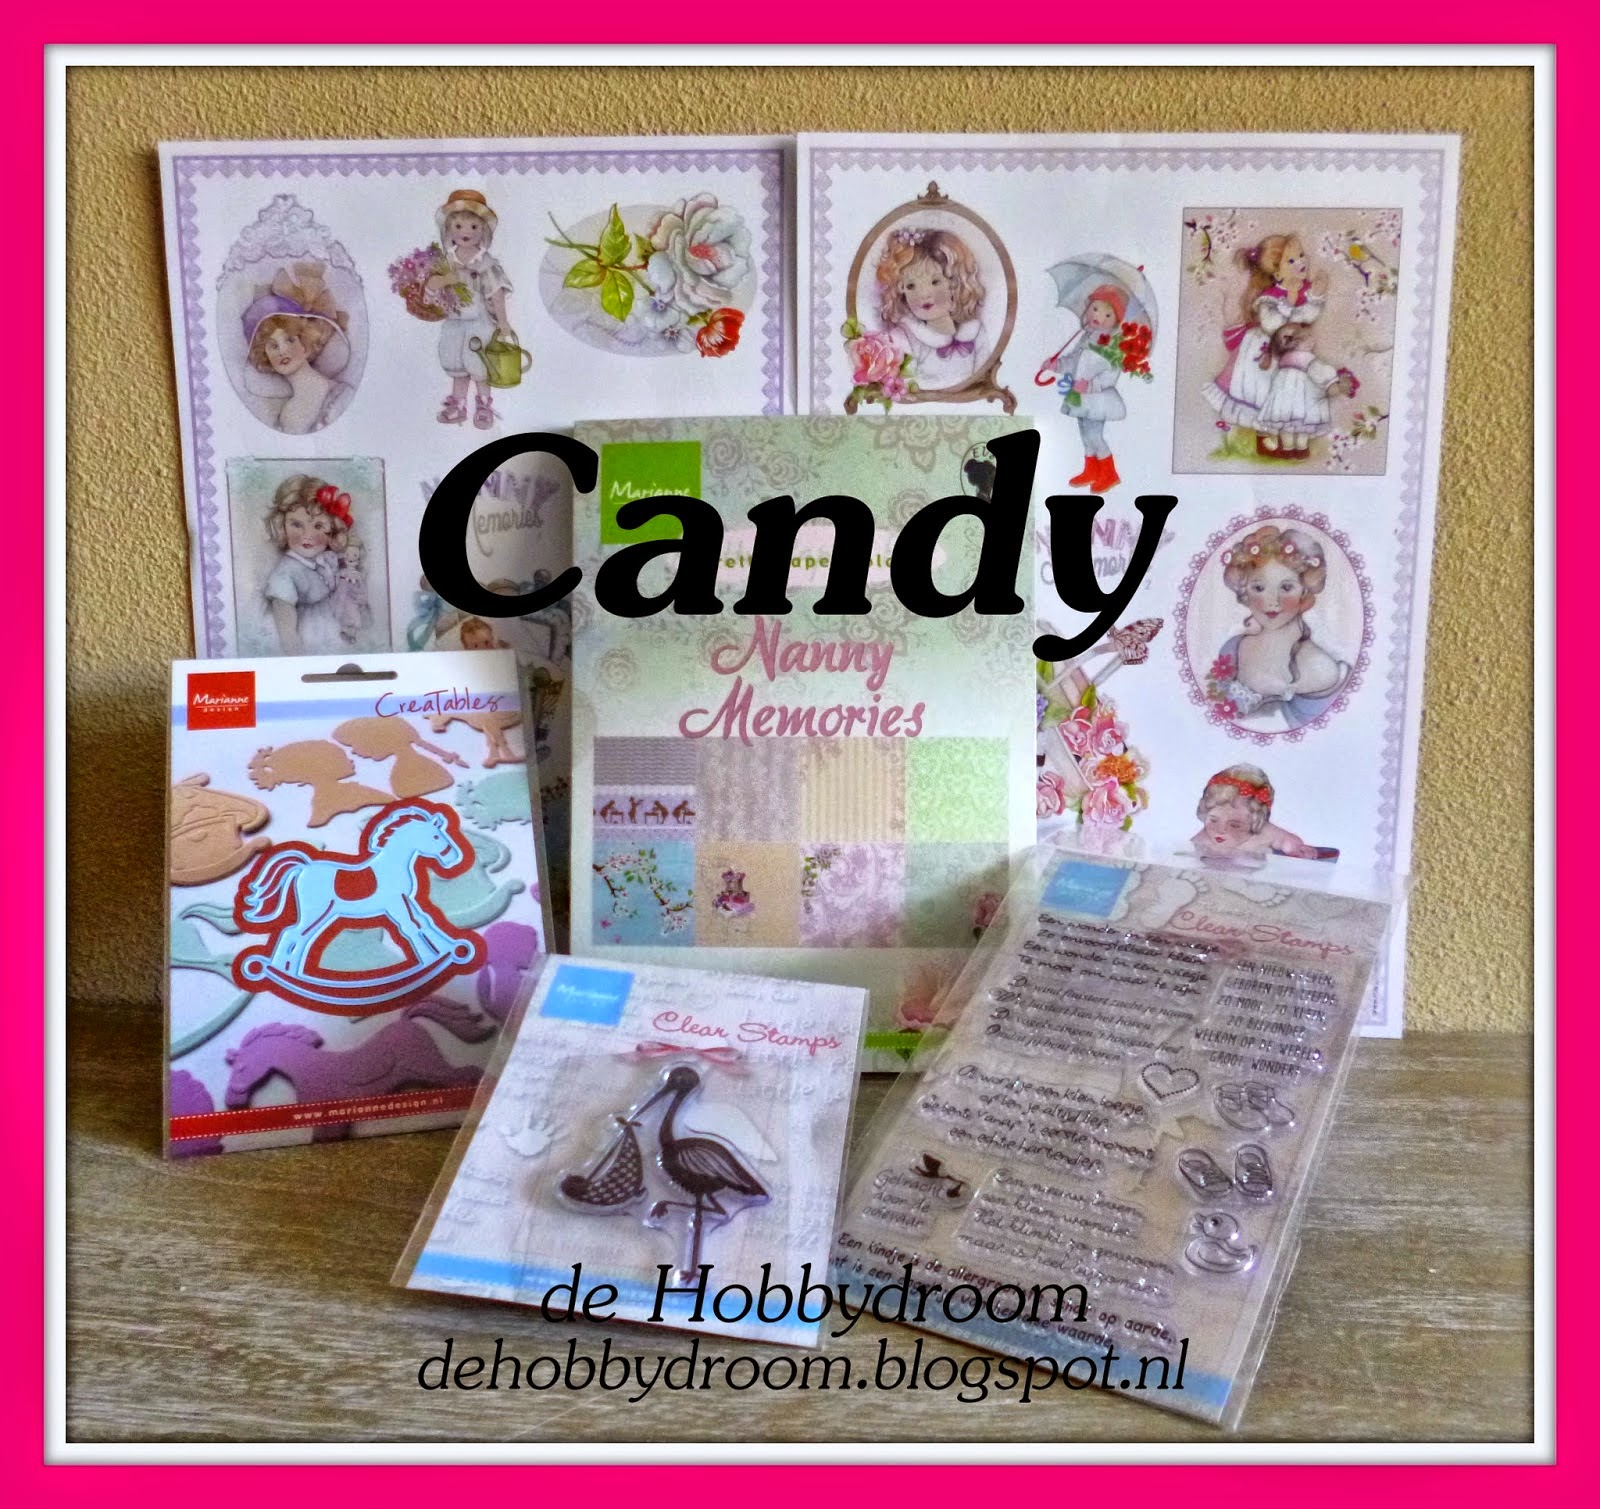 Candy bij Mandy (hobbydroom)